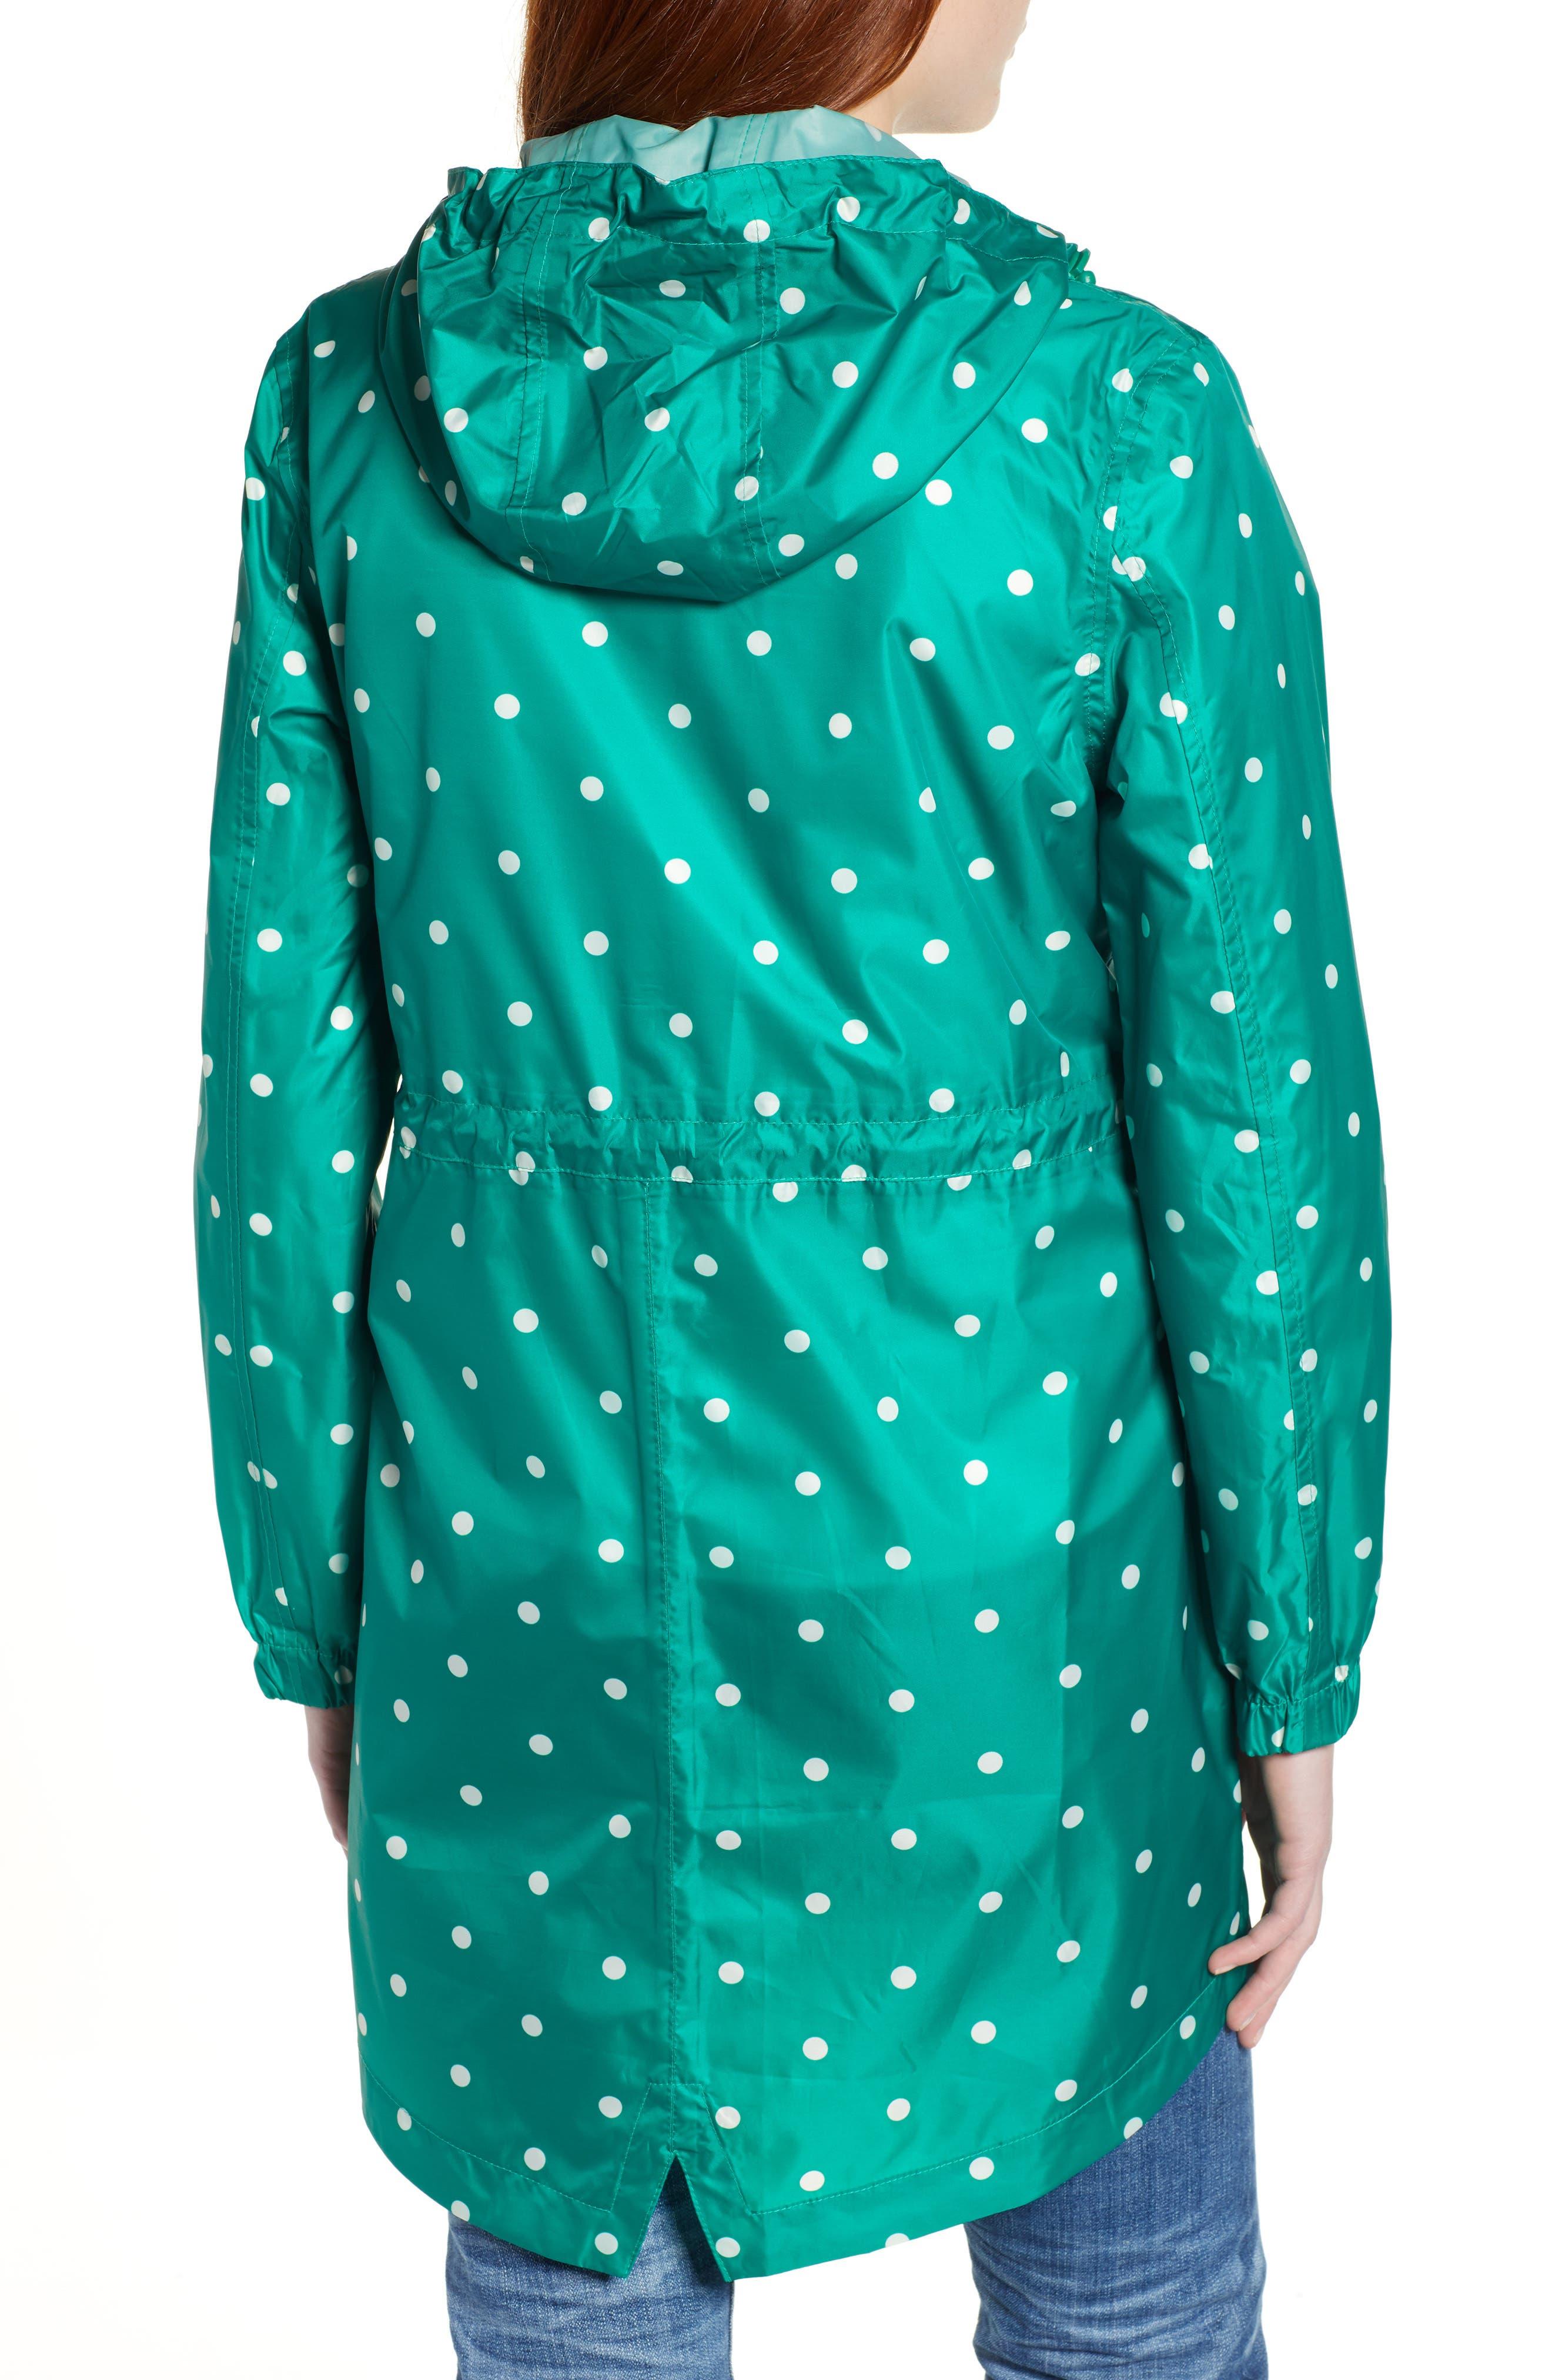 Go Lightly Waterproof Pack Away Hooded Jacket,                             Alternate thumbnail 2, color,                             GREEN SPOT